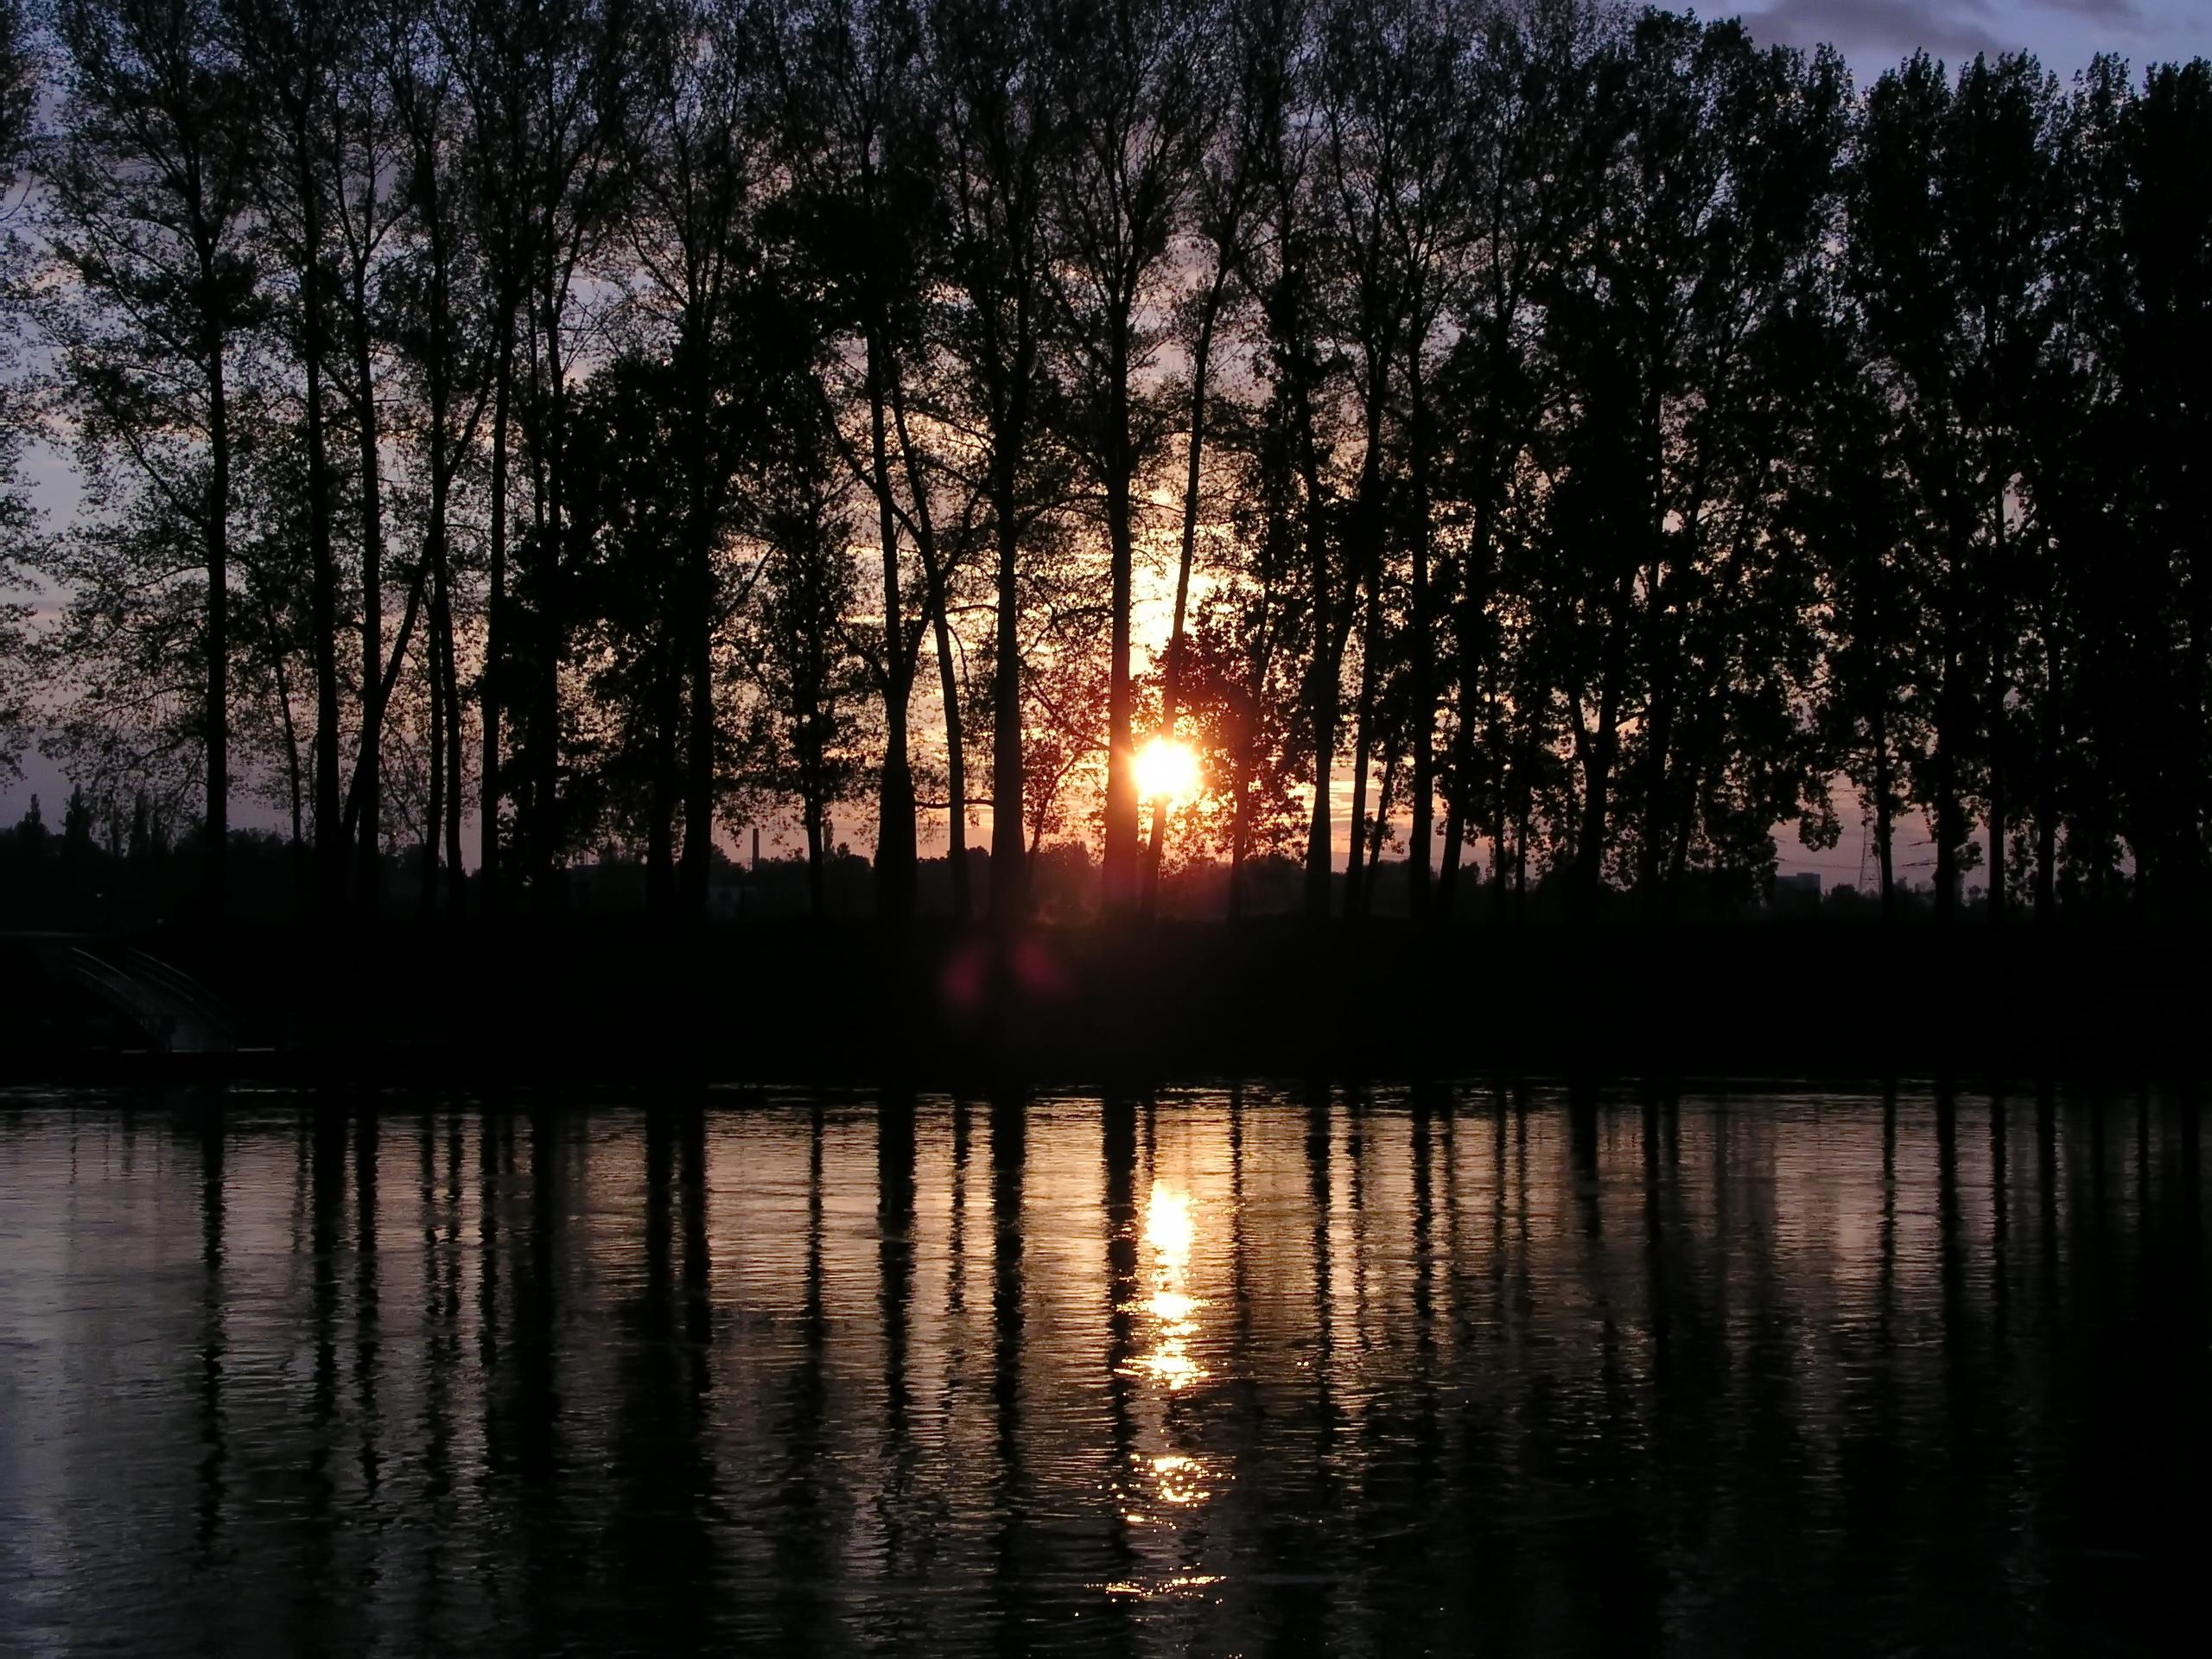 Sundown by UdoChristmann